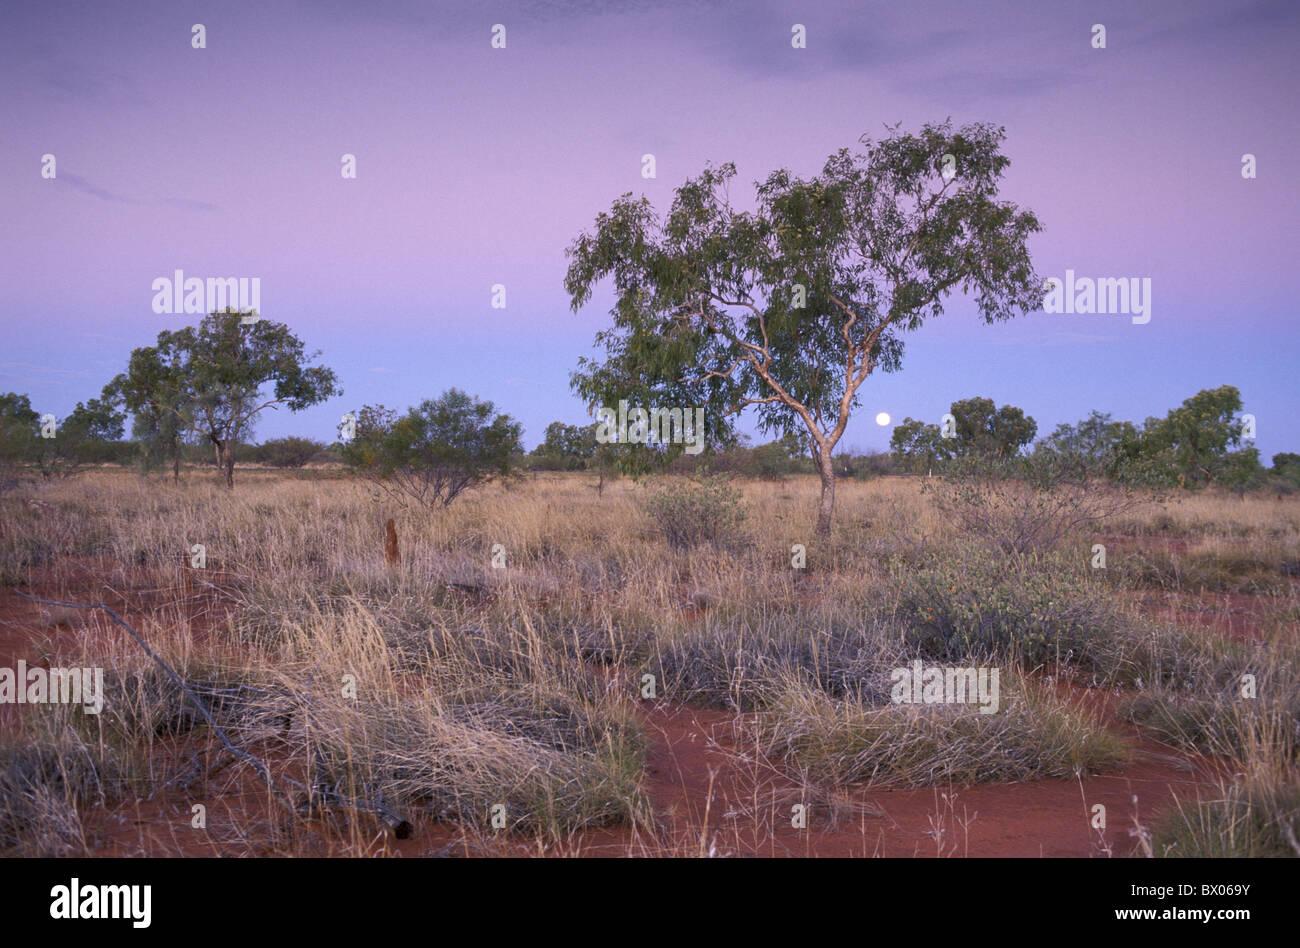 Barkly Homestead Australien Abenddämmerung Northern Territory Outback Landschaft Wüstenlandschaft Bäume Stockbild